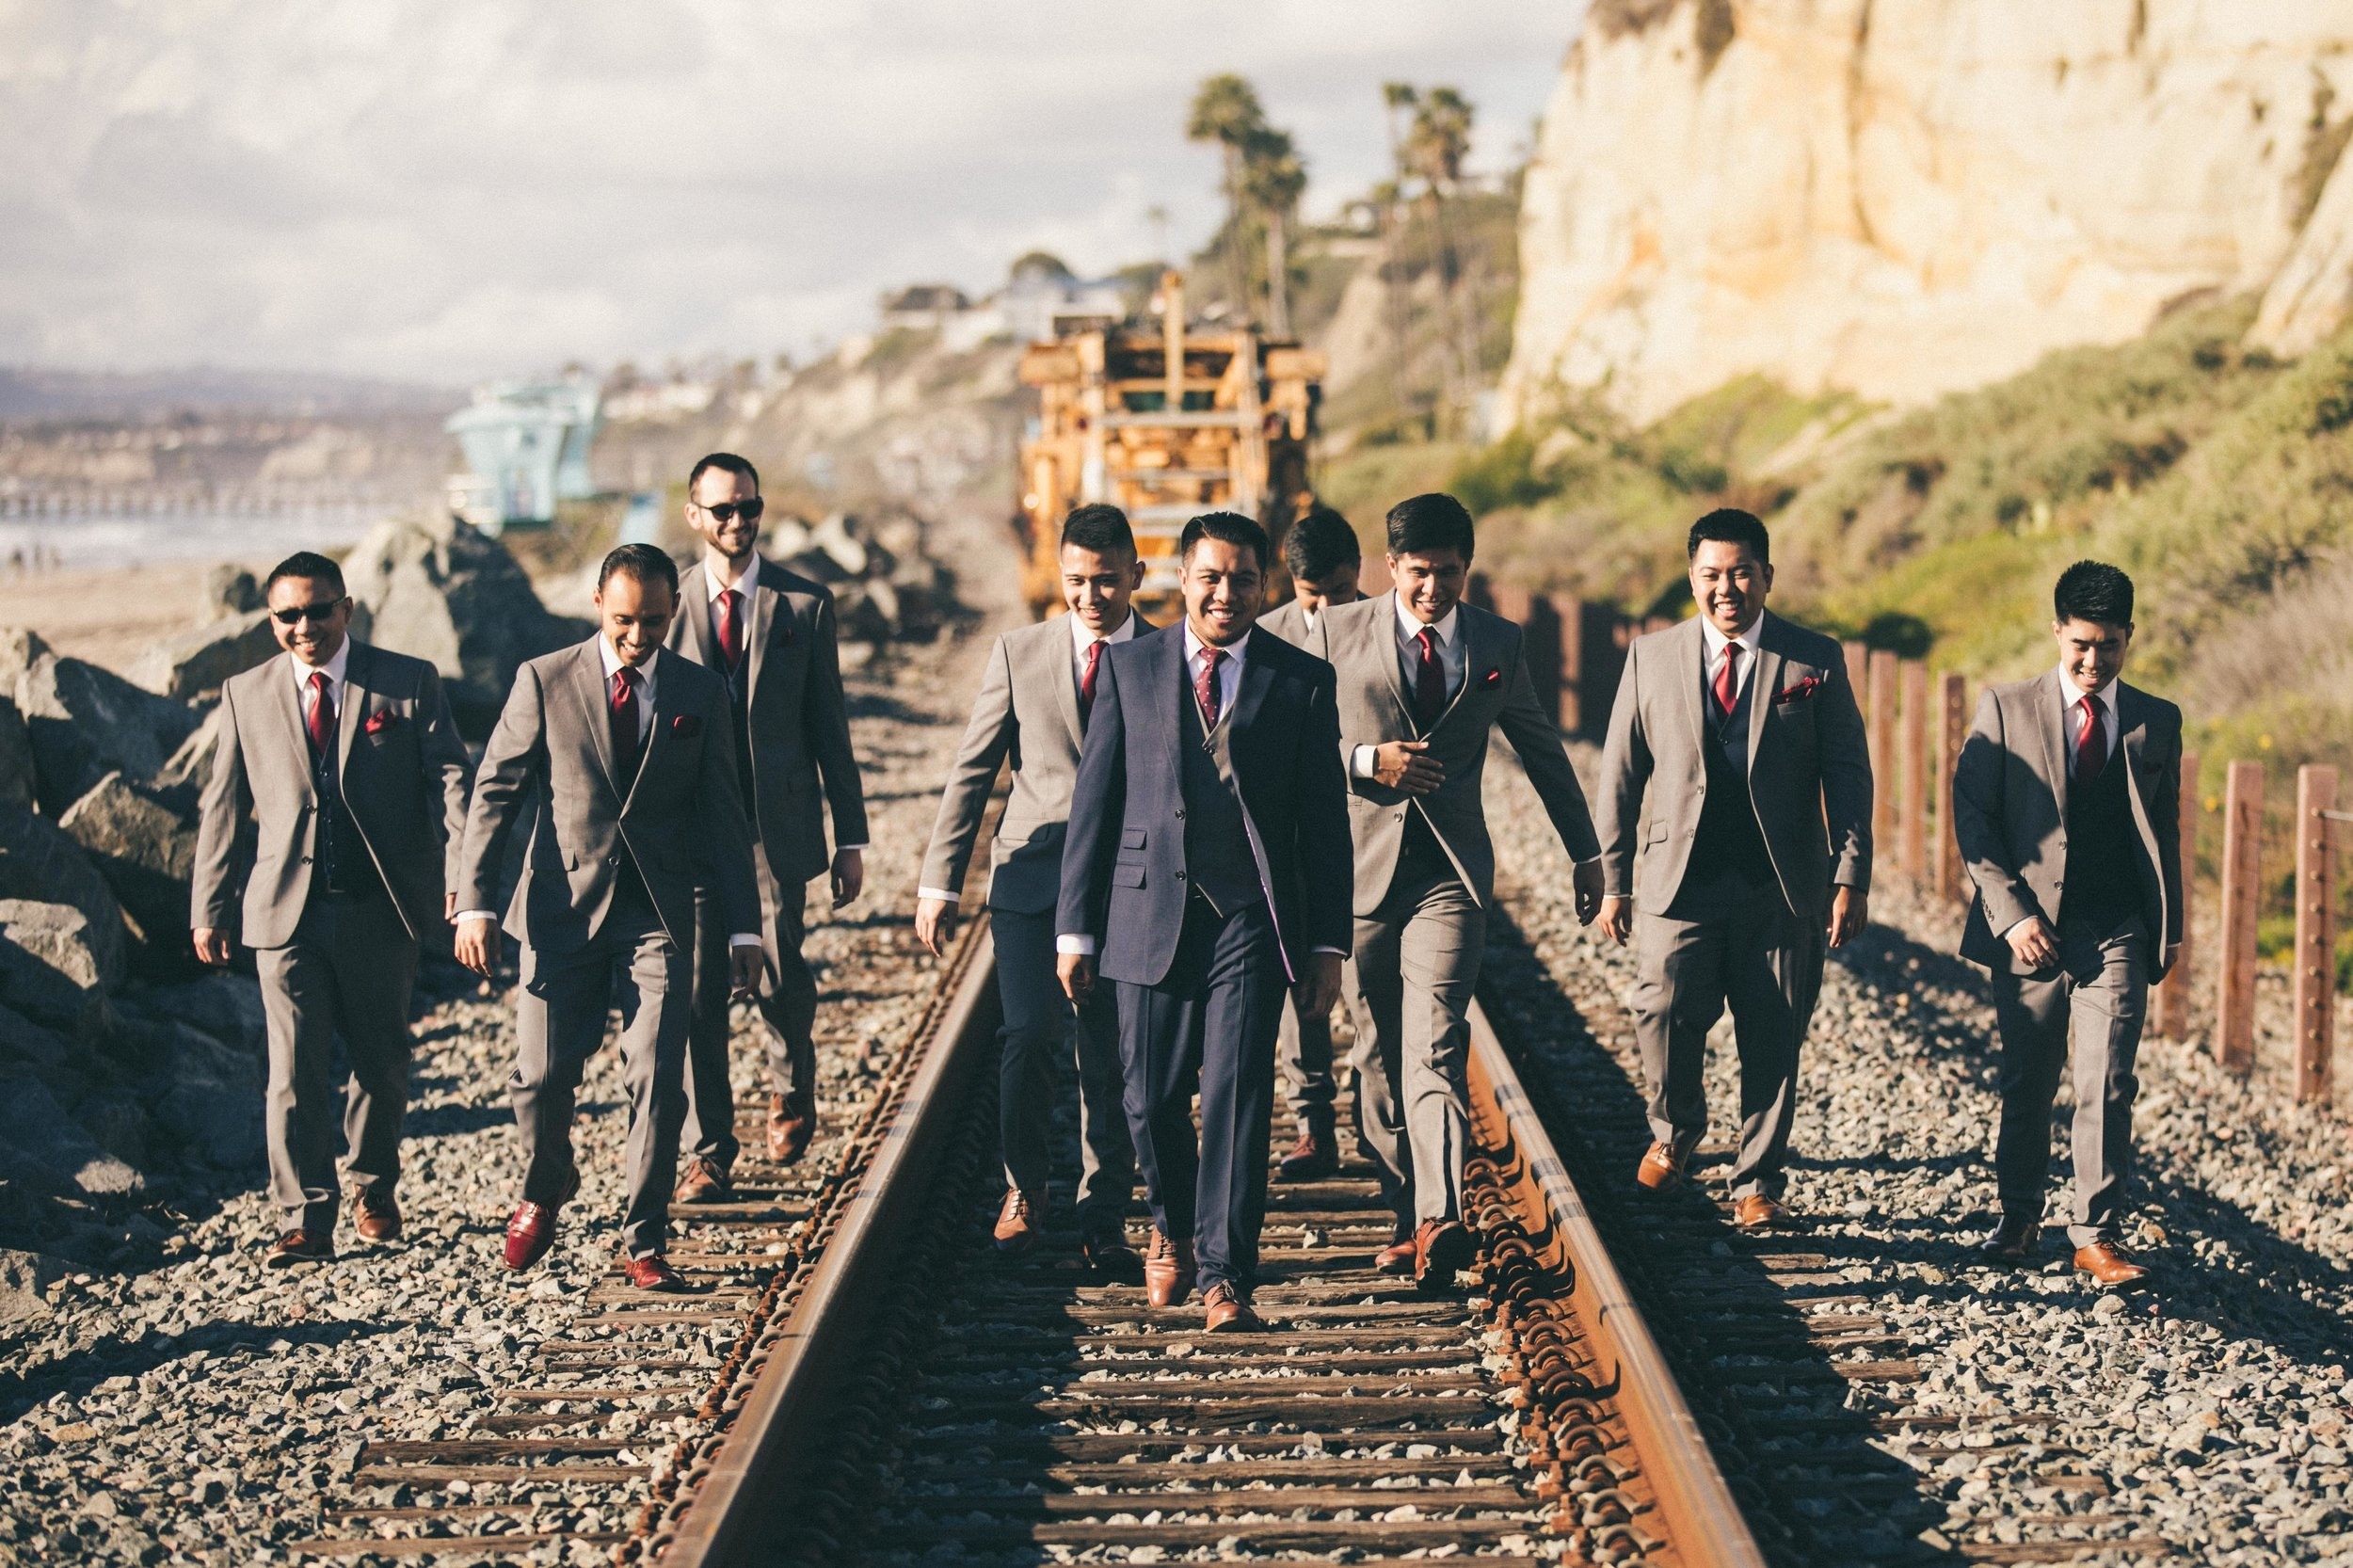 southern_california_wedding_joshuachun_photography-7.JPG